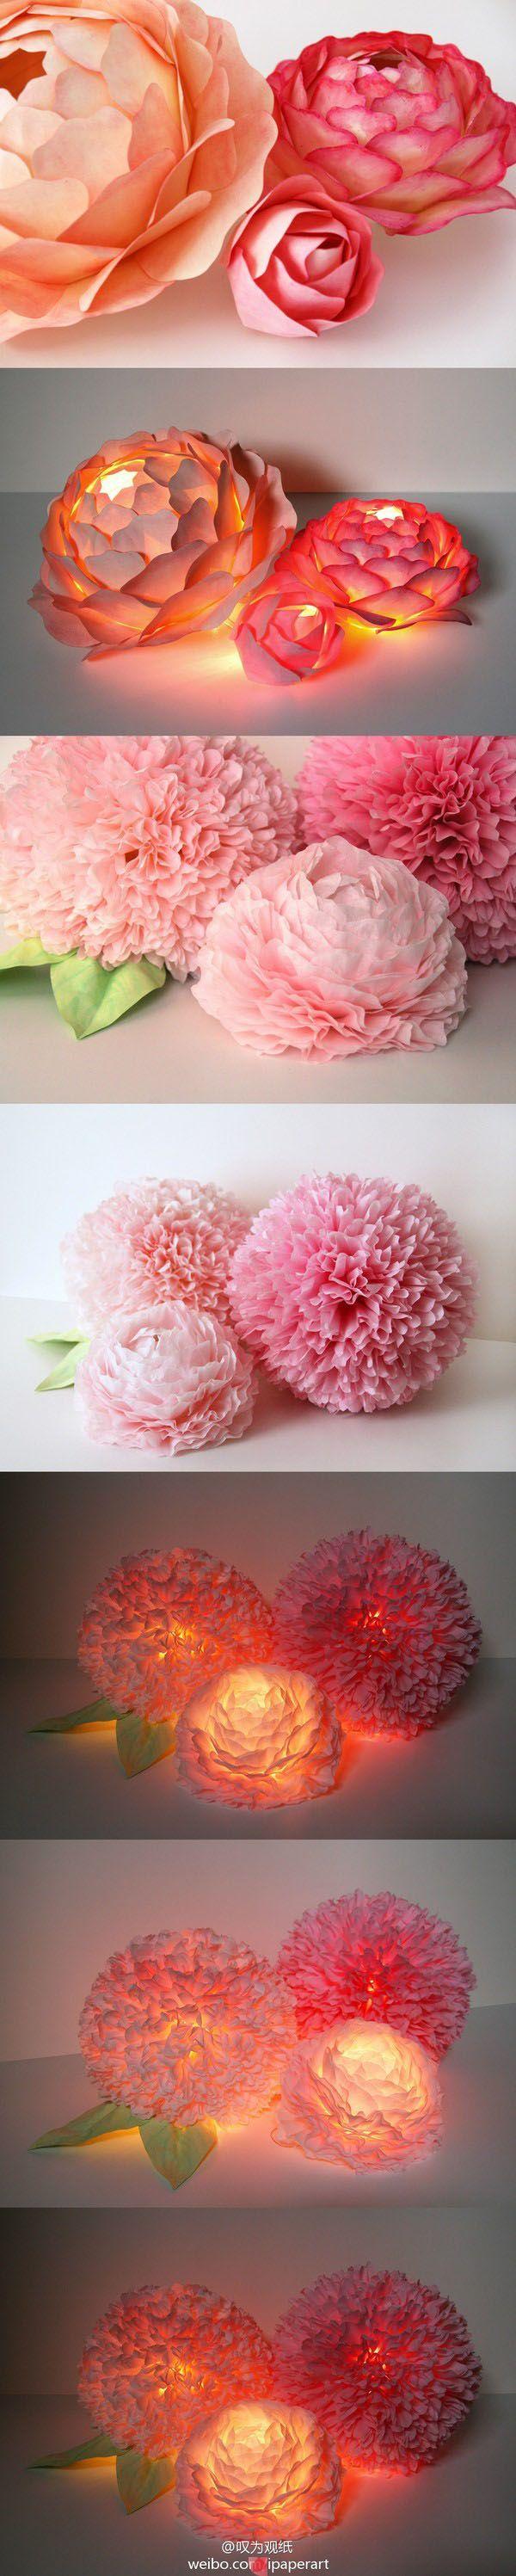 Mesmerizing Doityourself Handmade Paper Flower Art Projects To